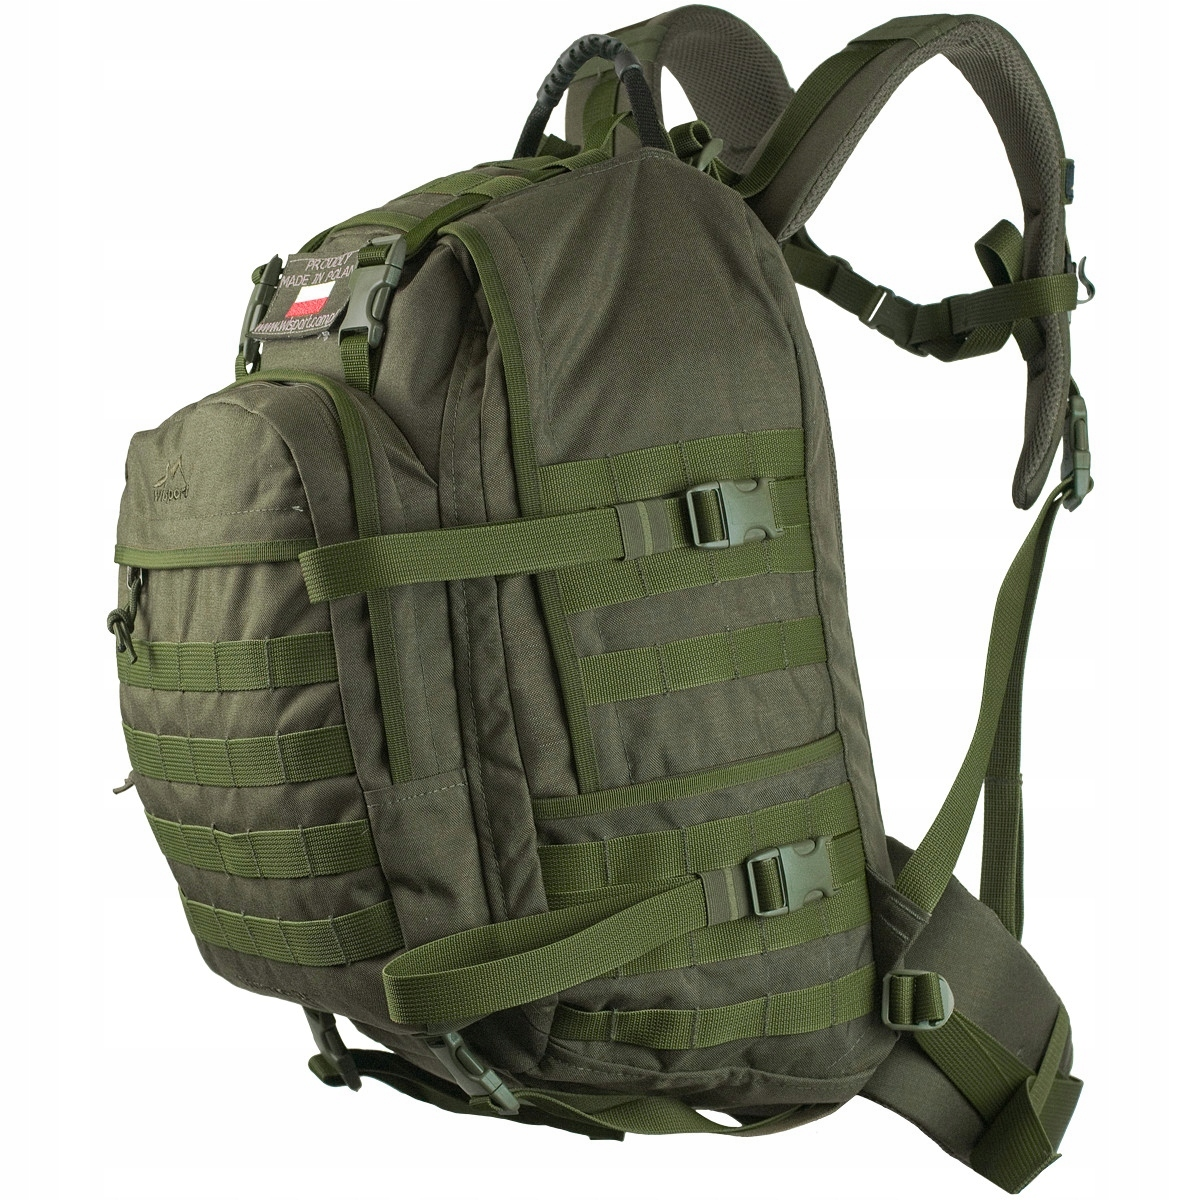 a55600e16b130 Plecak Wisport Whistler 35L Ral-7013 gen.I - 7466273195 - oficjalne ...